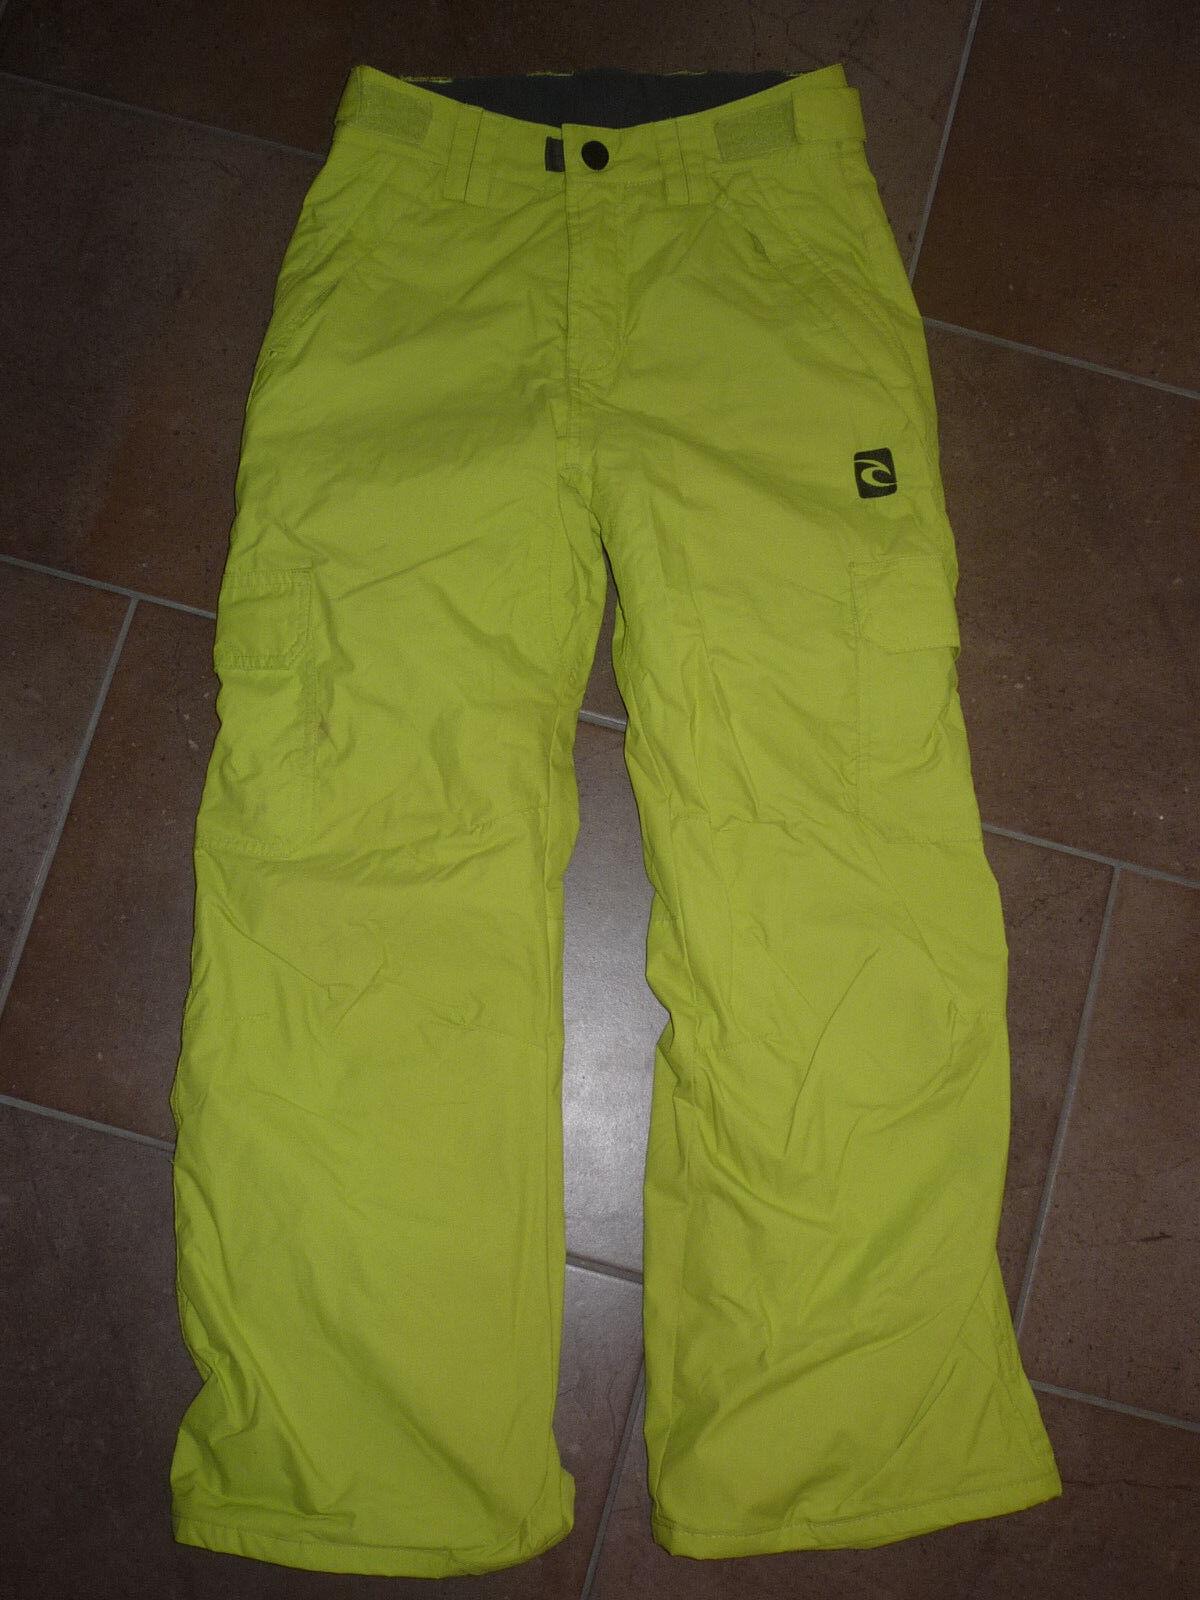 TOP RIP CURL Junior Ski Pants Pants Pants Skihose Snowboardhose neon grün Gr.140 b8b11c